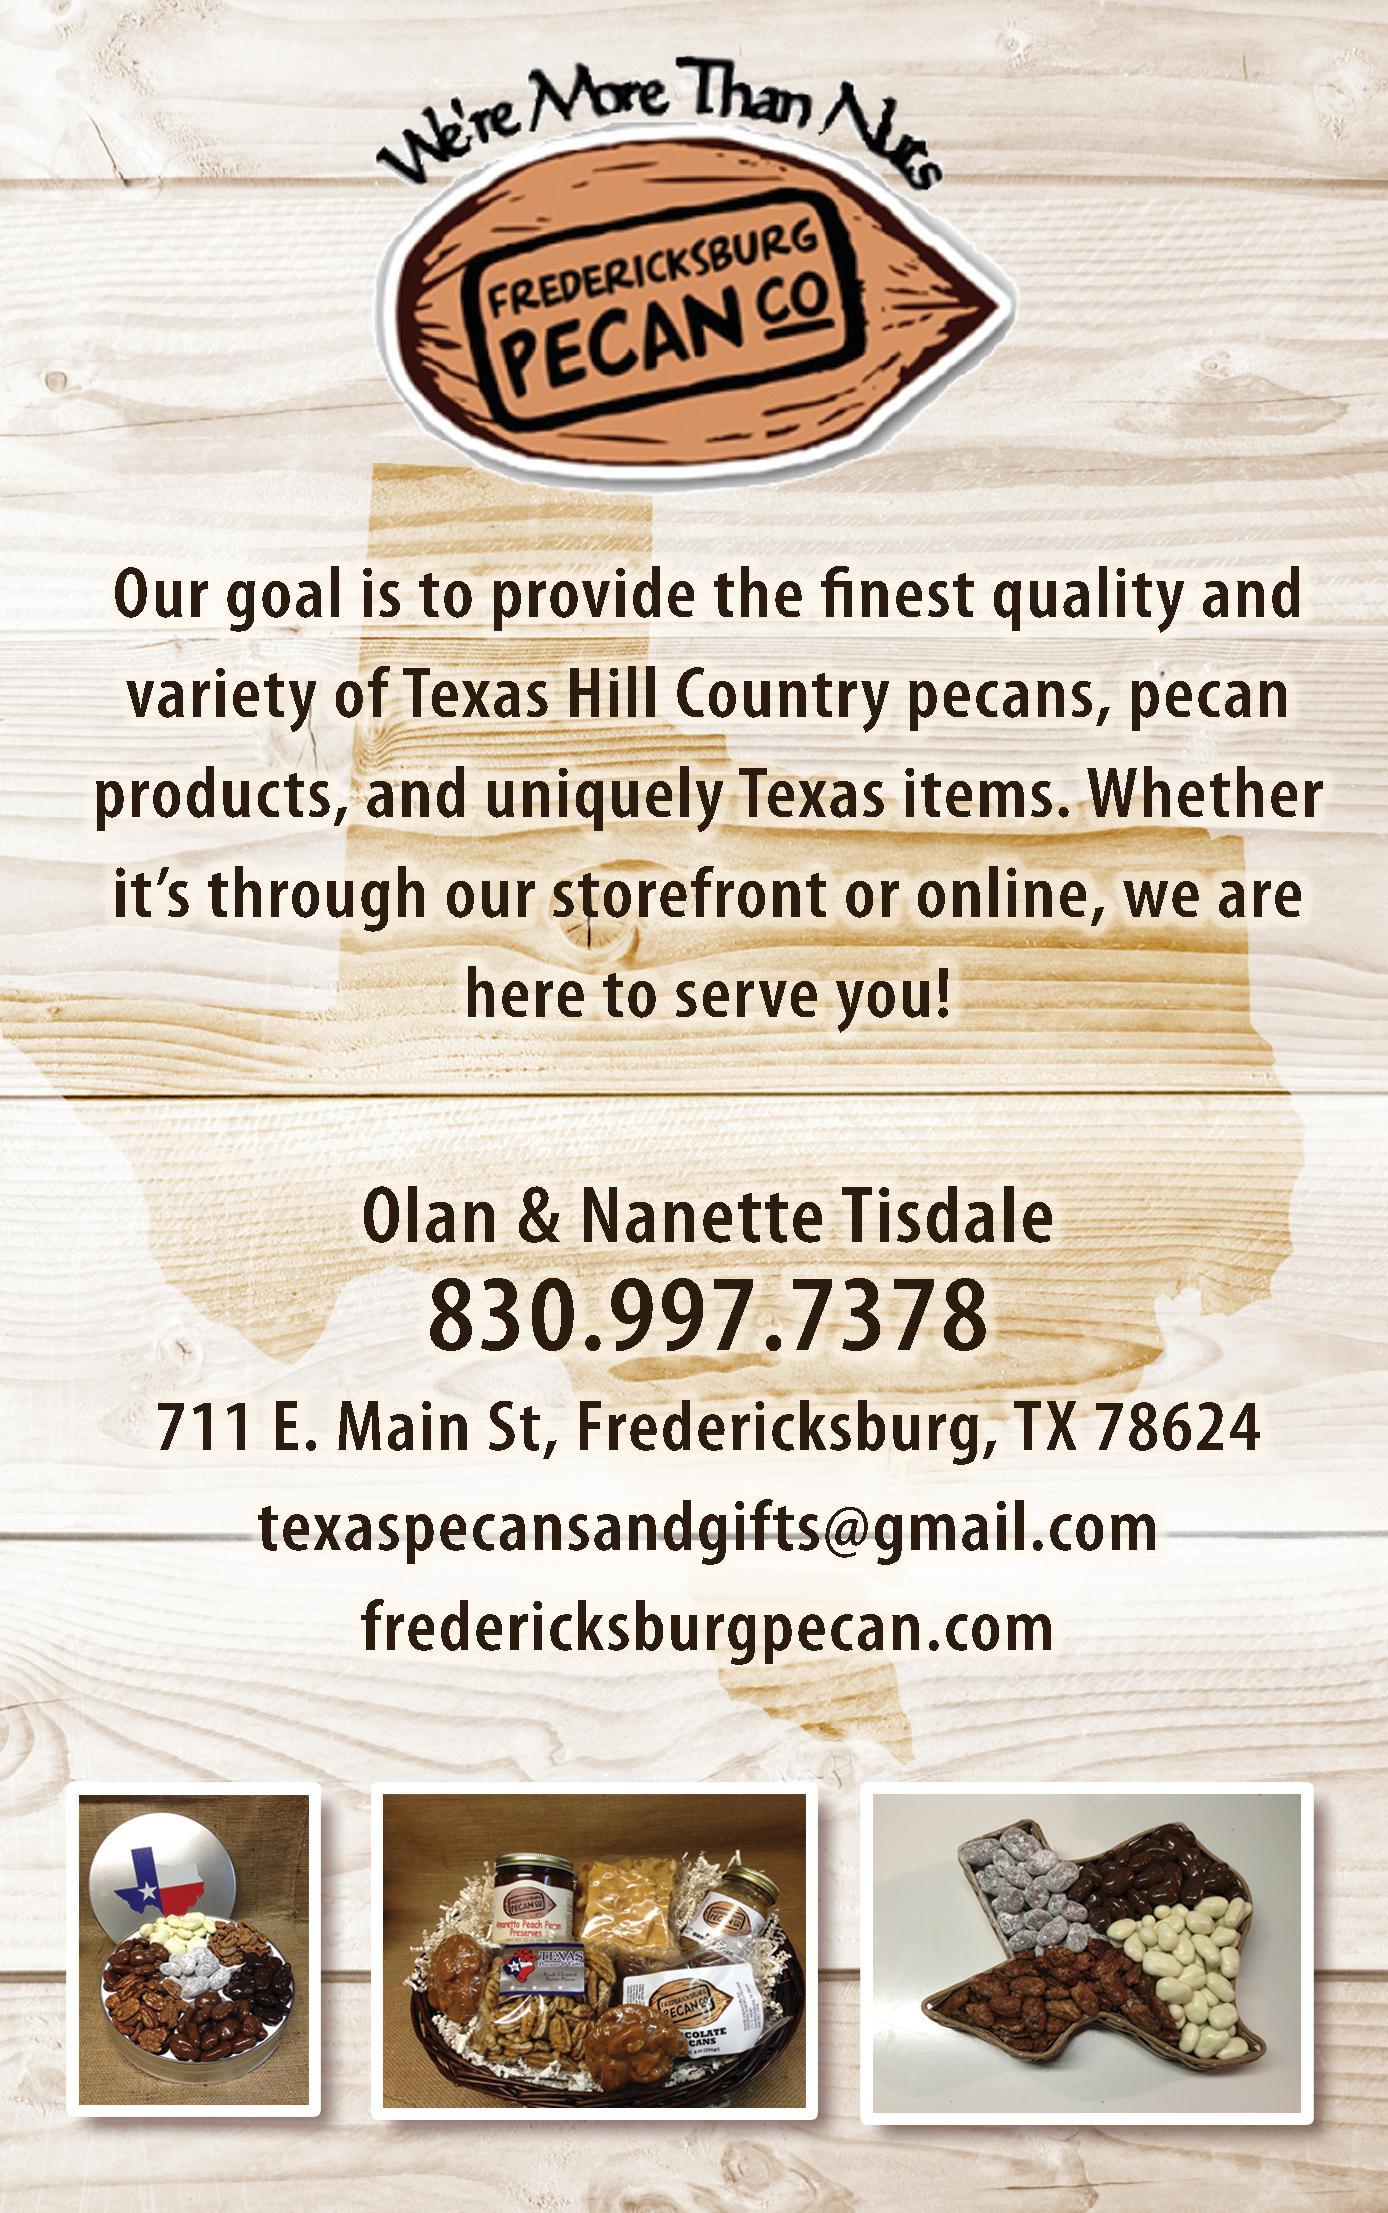 Fredericksburg Pecan Company,LLC